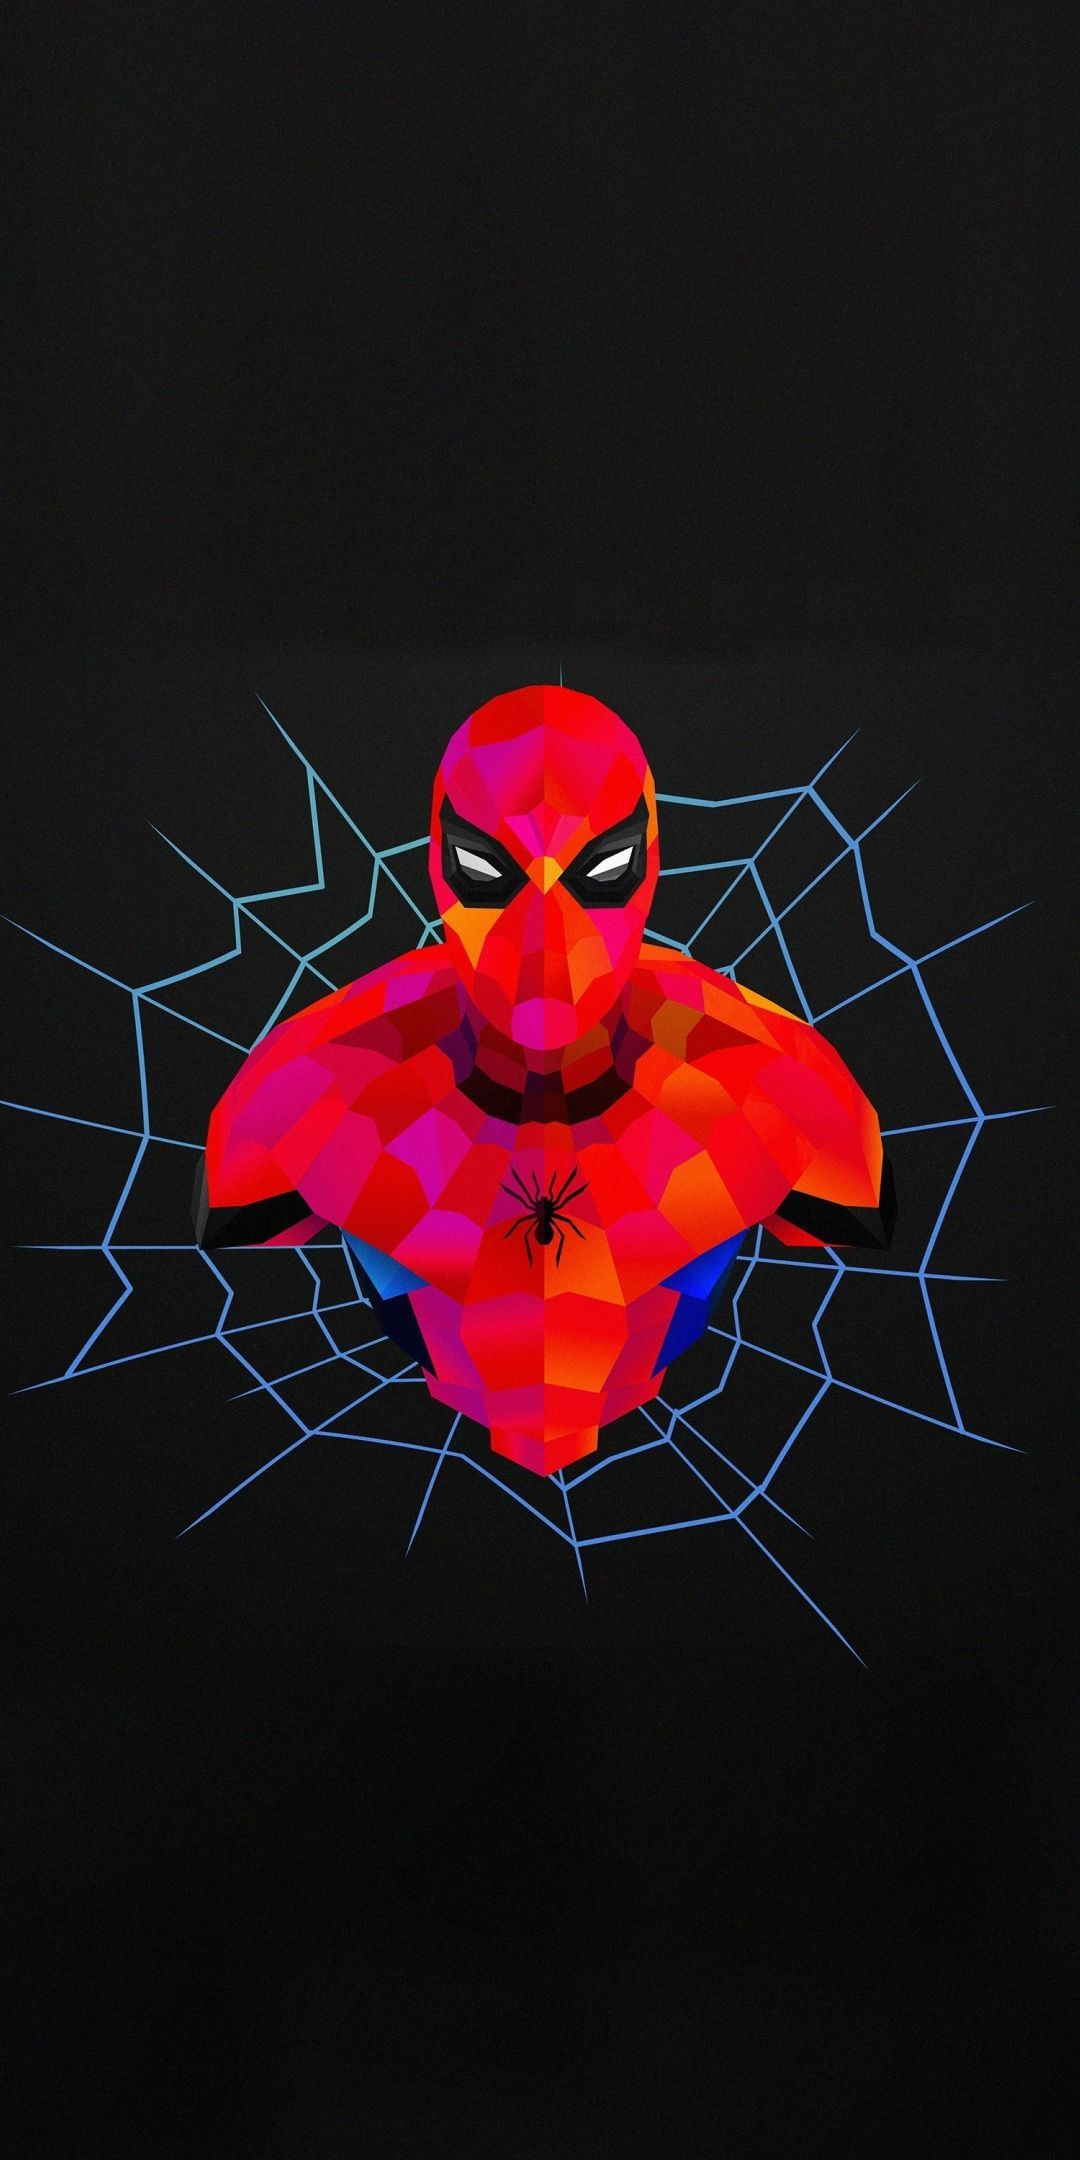 Minimalist Spider-Man Wallpapers - Top ...